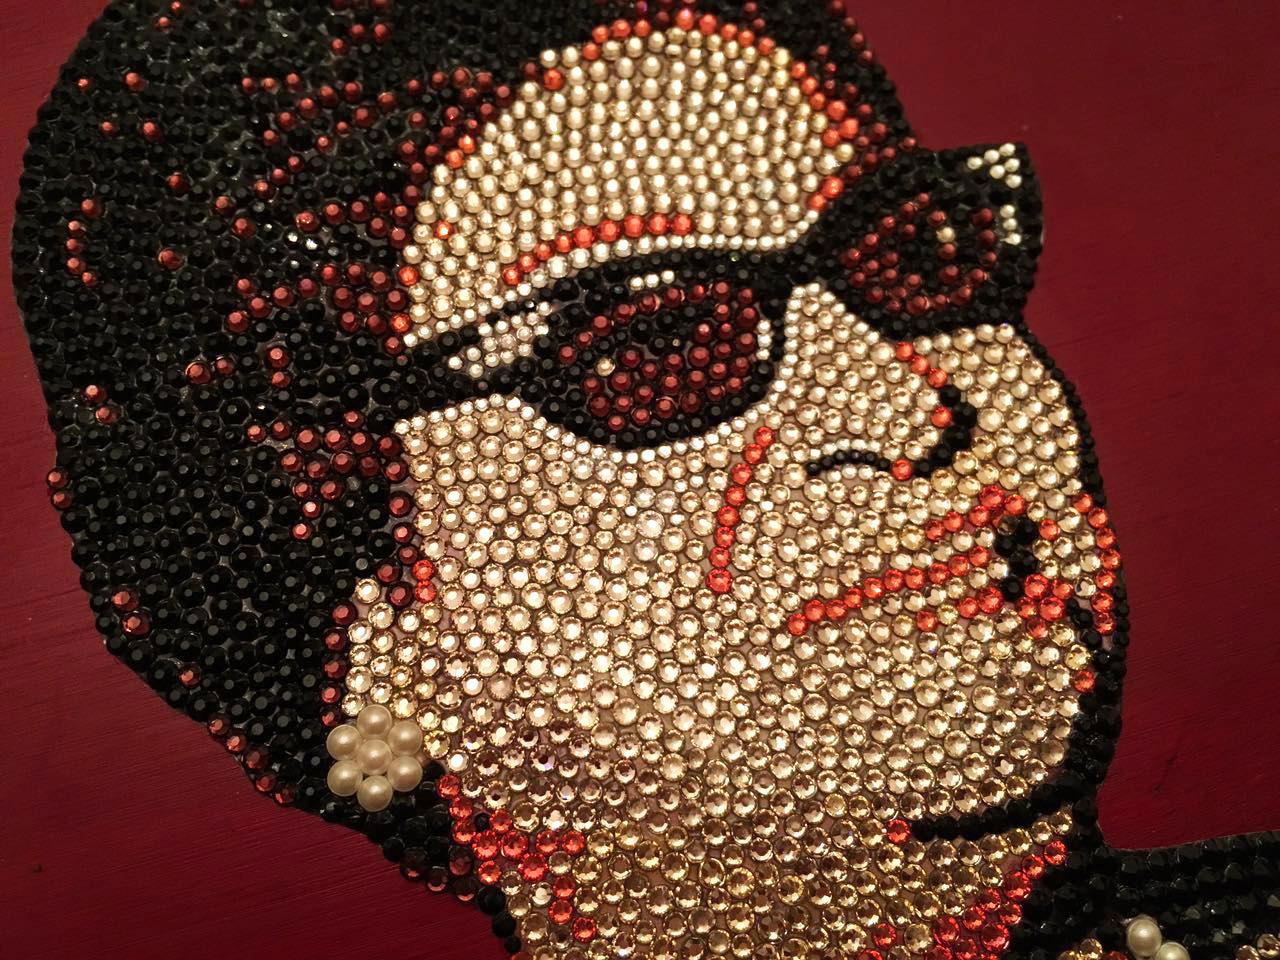 Umm Kulthum Art Natalie Daghestani6